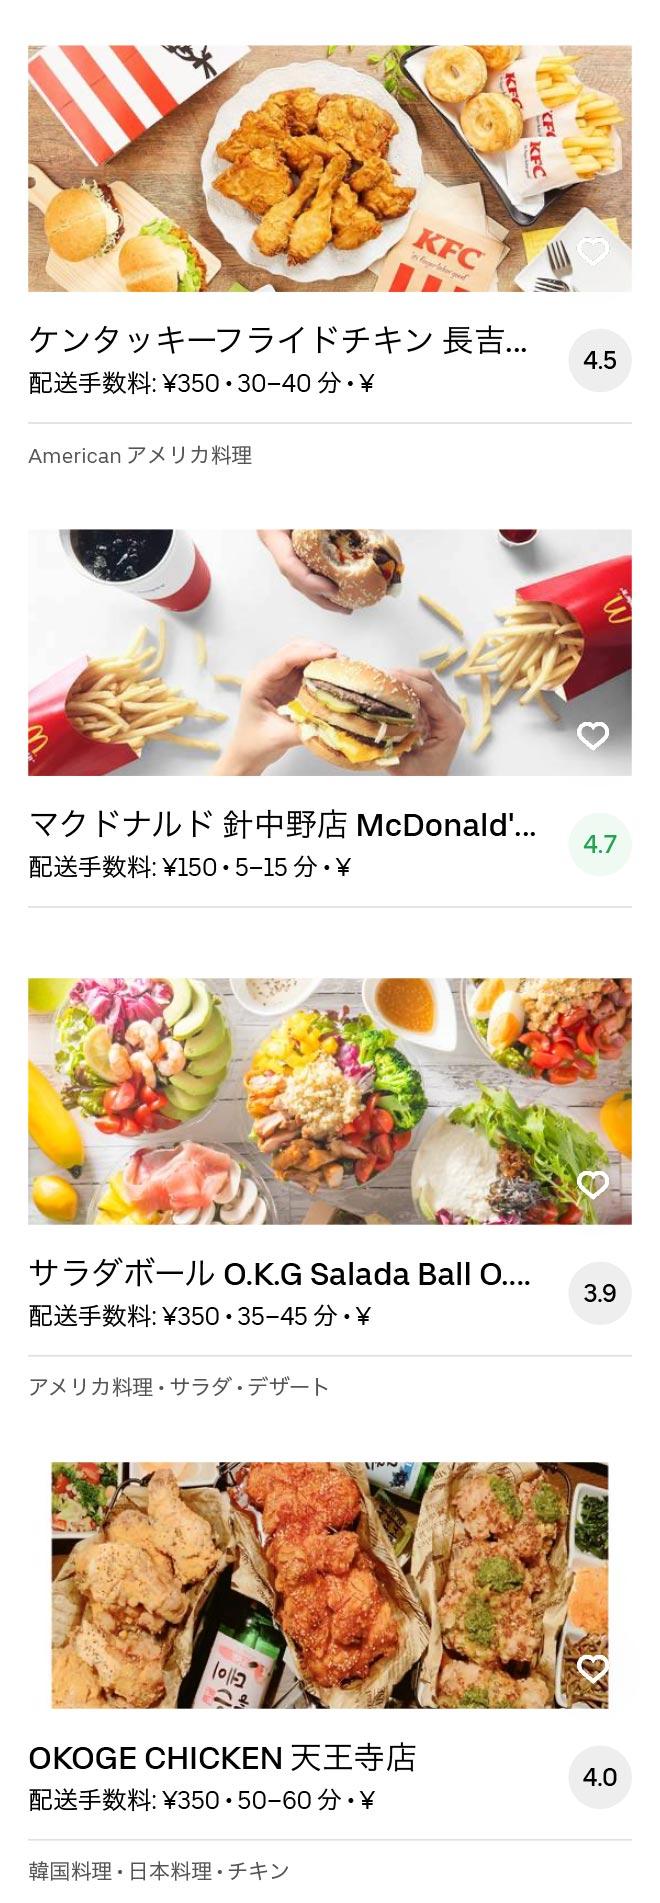 Osaka harinakano menu 2005 02